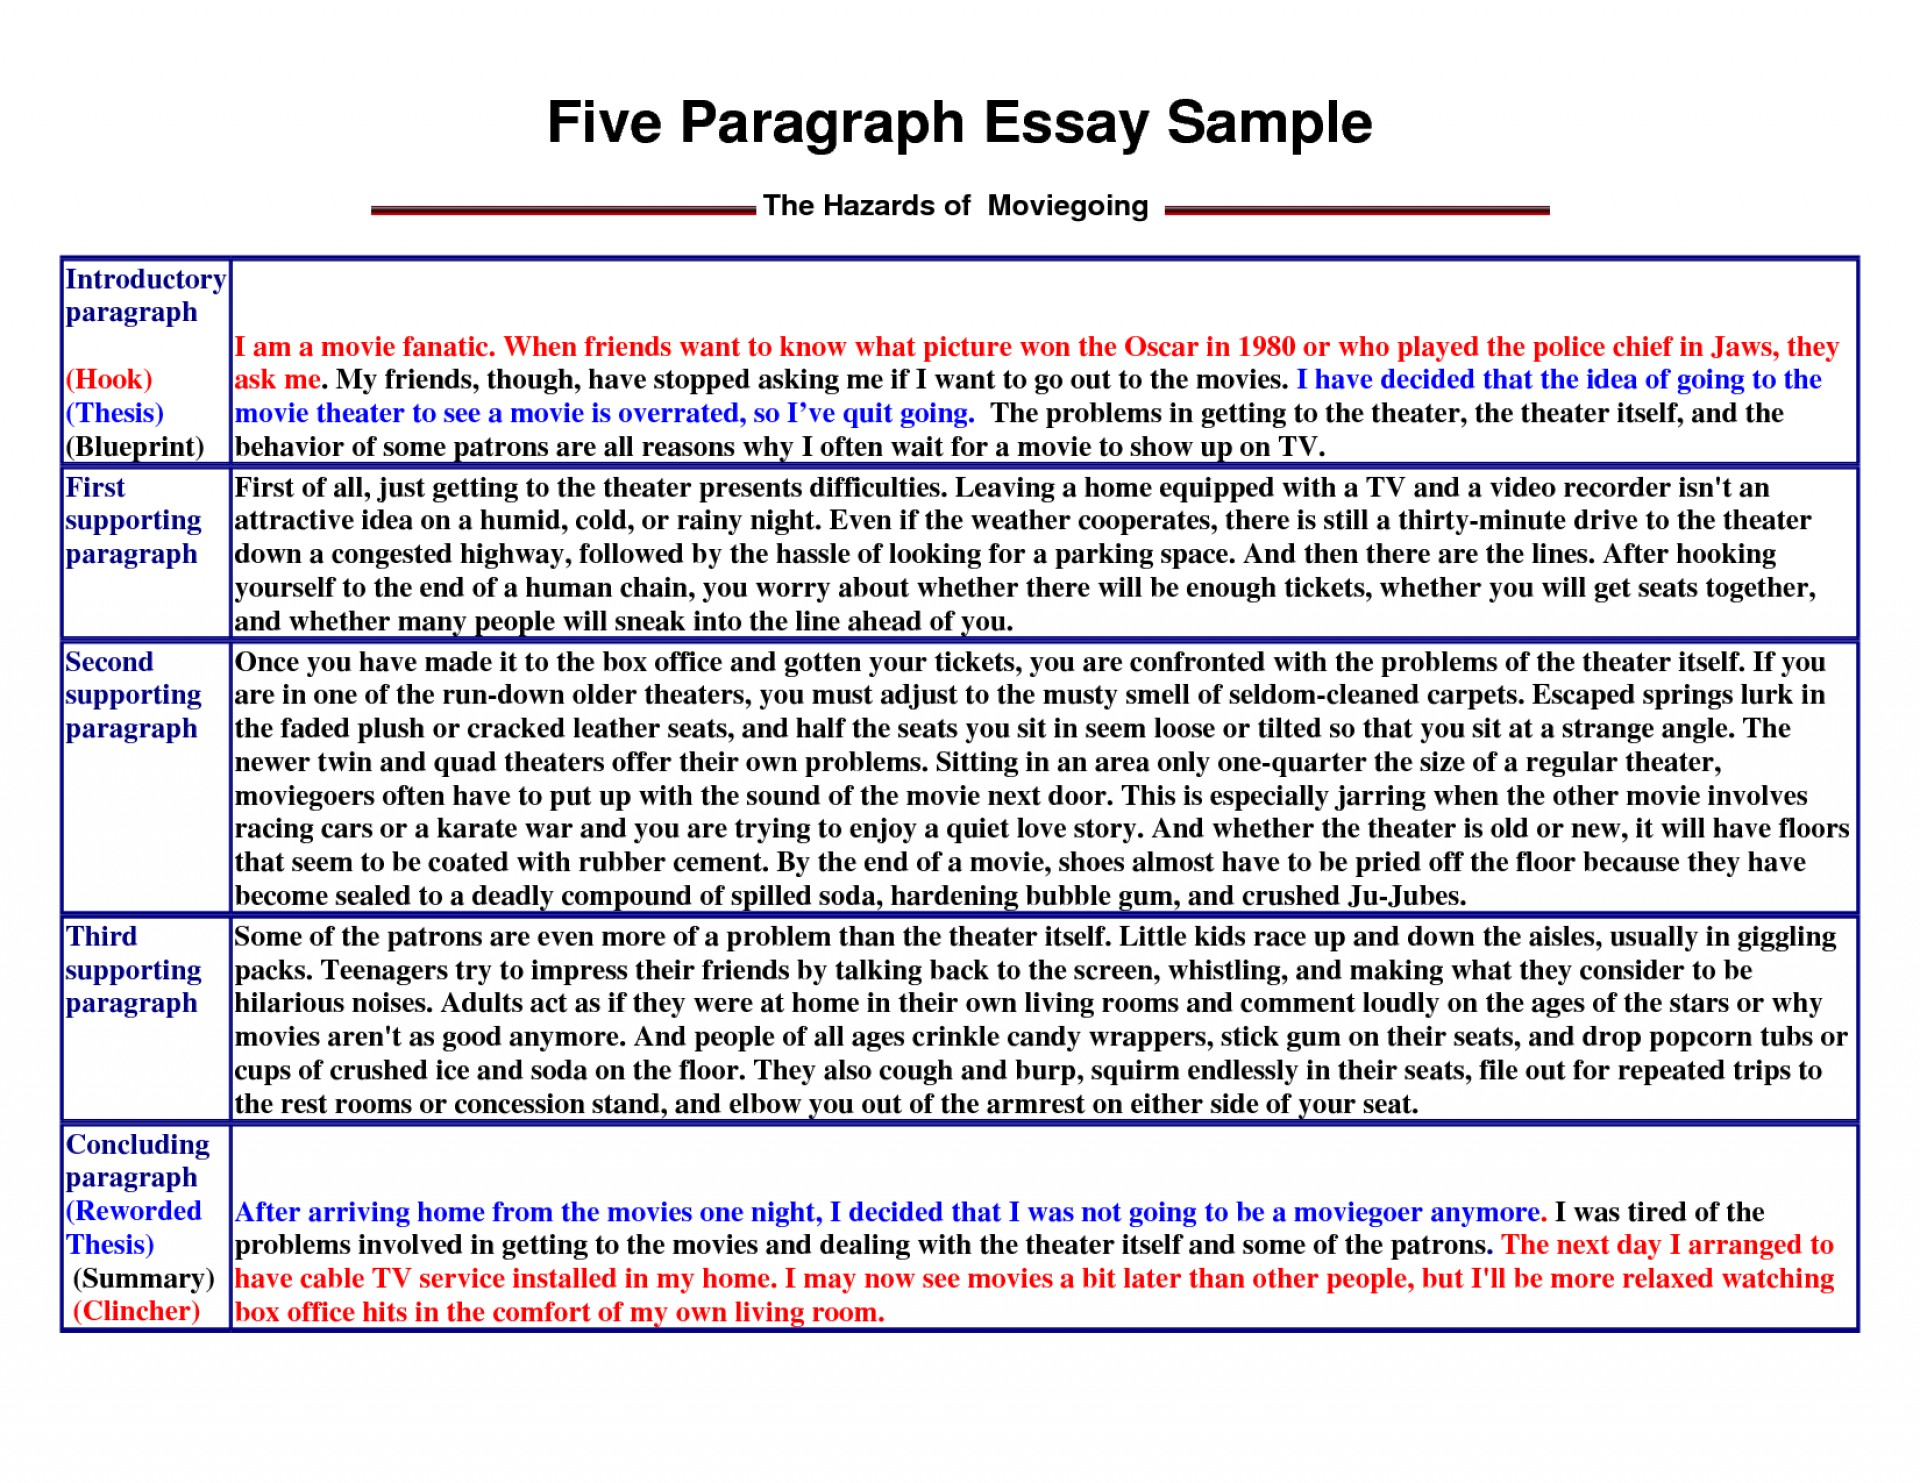 008 Paragraph Essay Sample Example Stirring 5 High School Pdf Argumentative Outline Template Five 1920